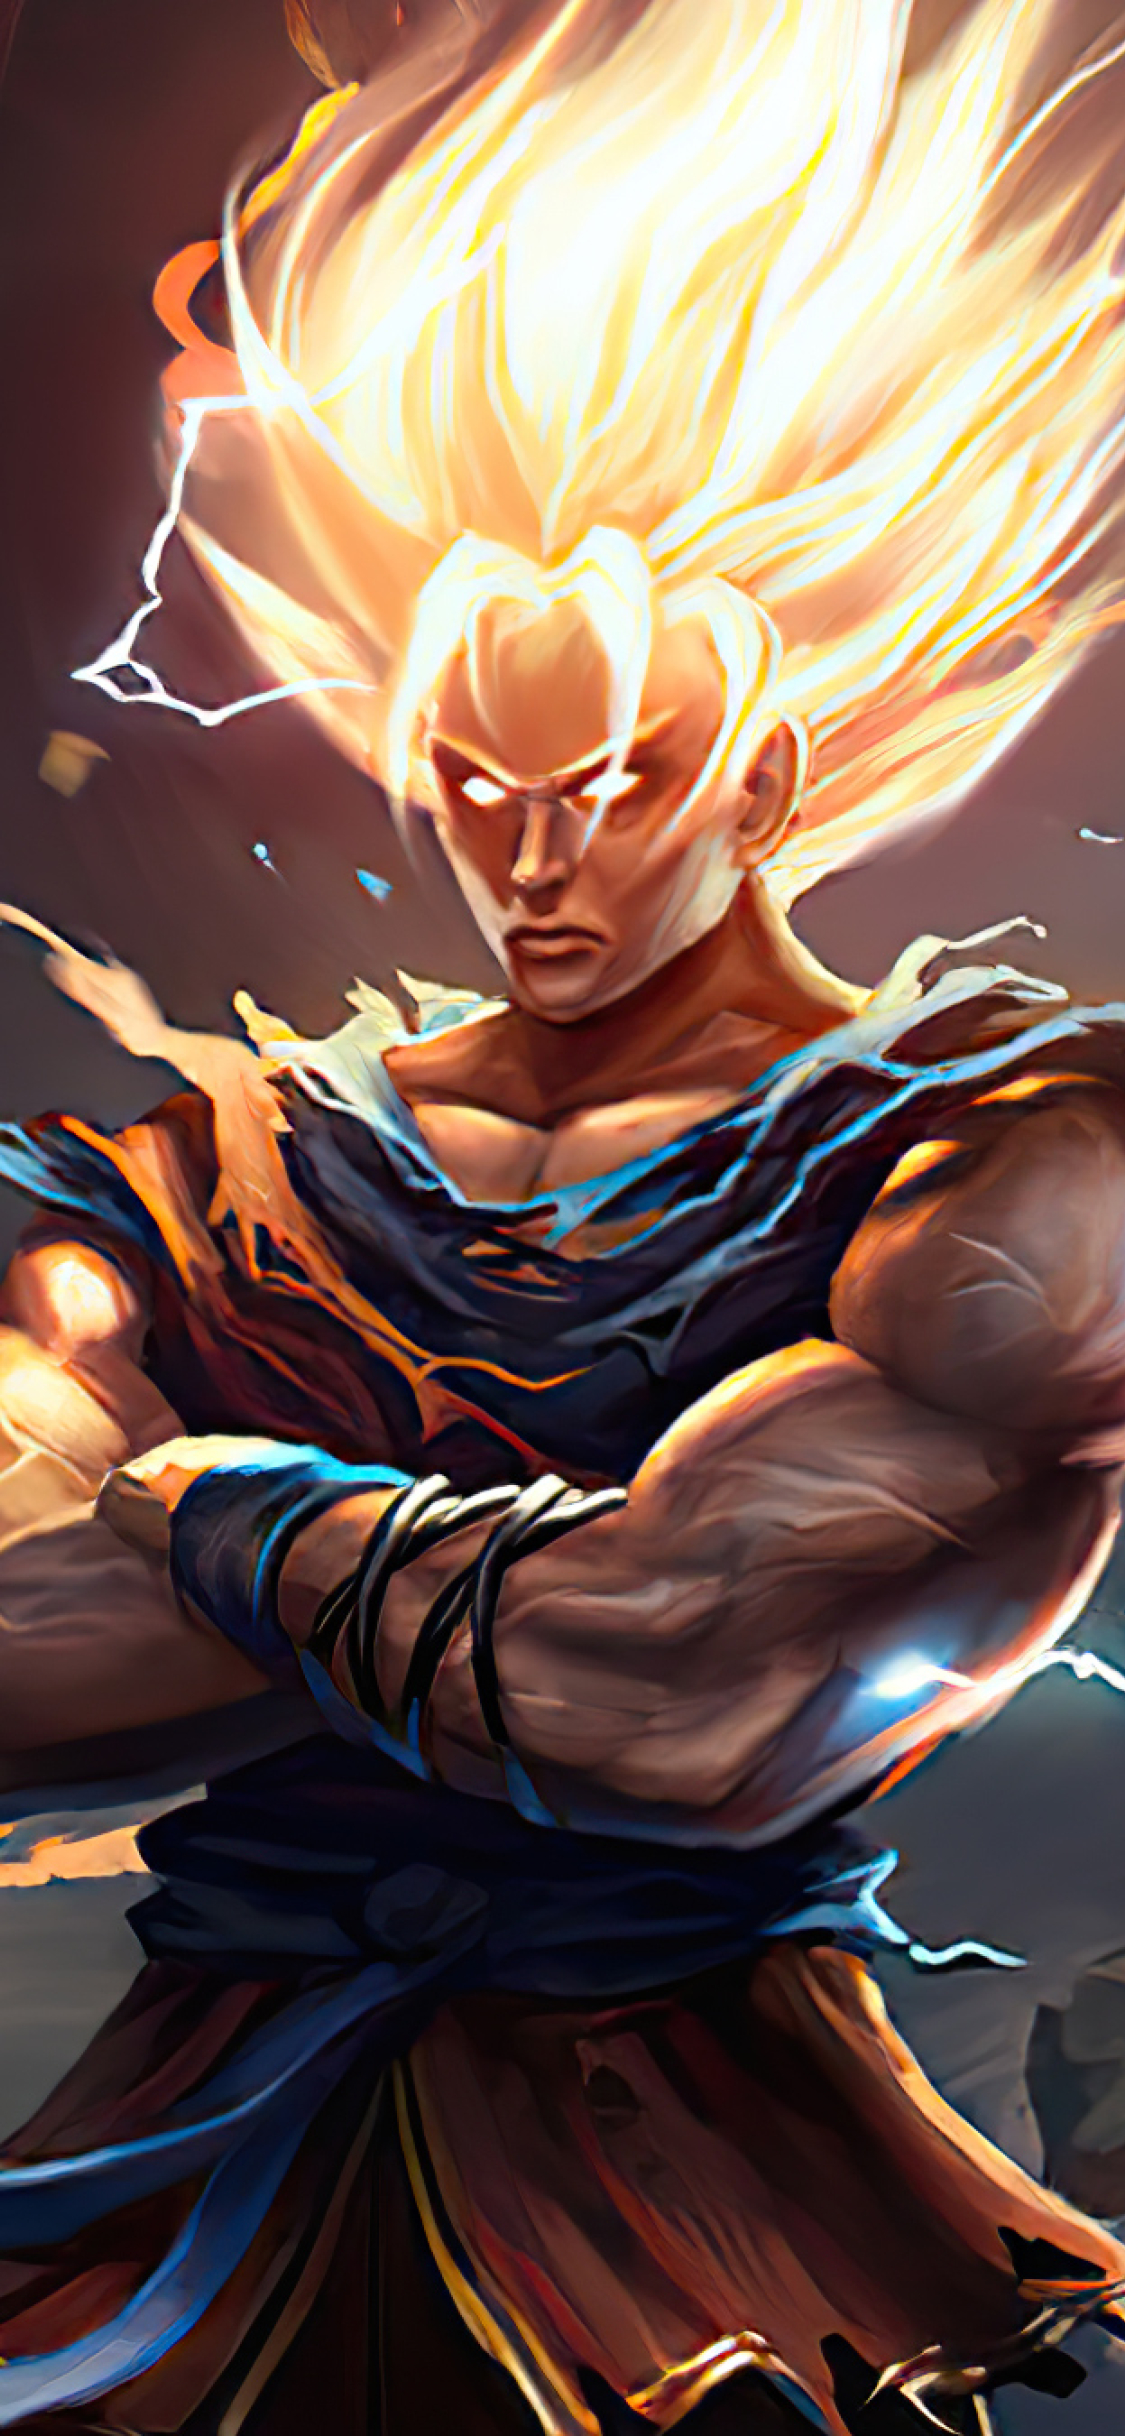 1125x2436 Goku New Dragon Ball Z Art Iphone XS,Iphone 10 ...